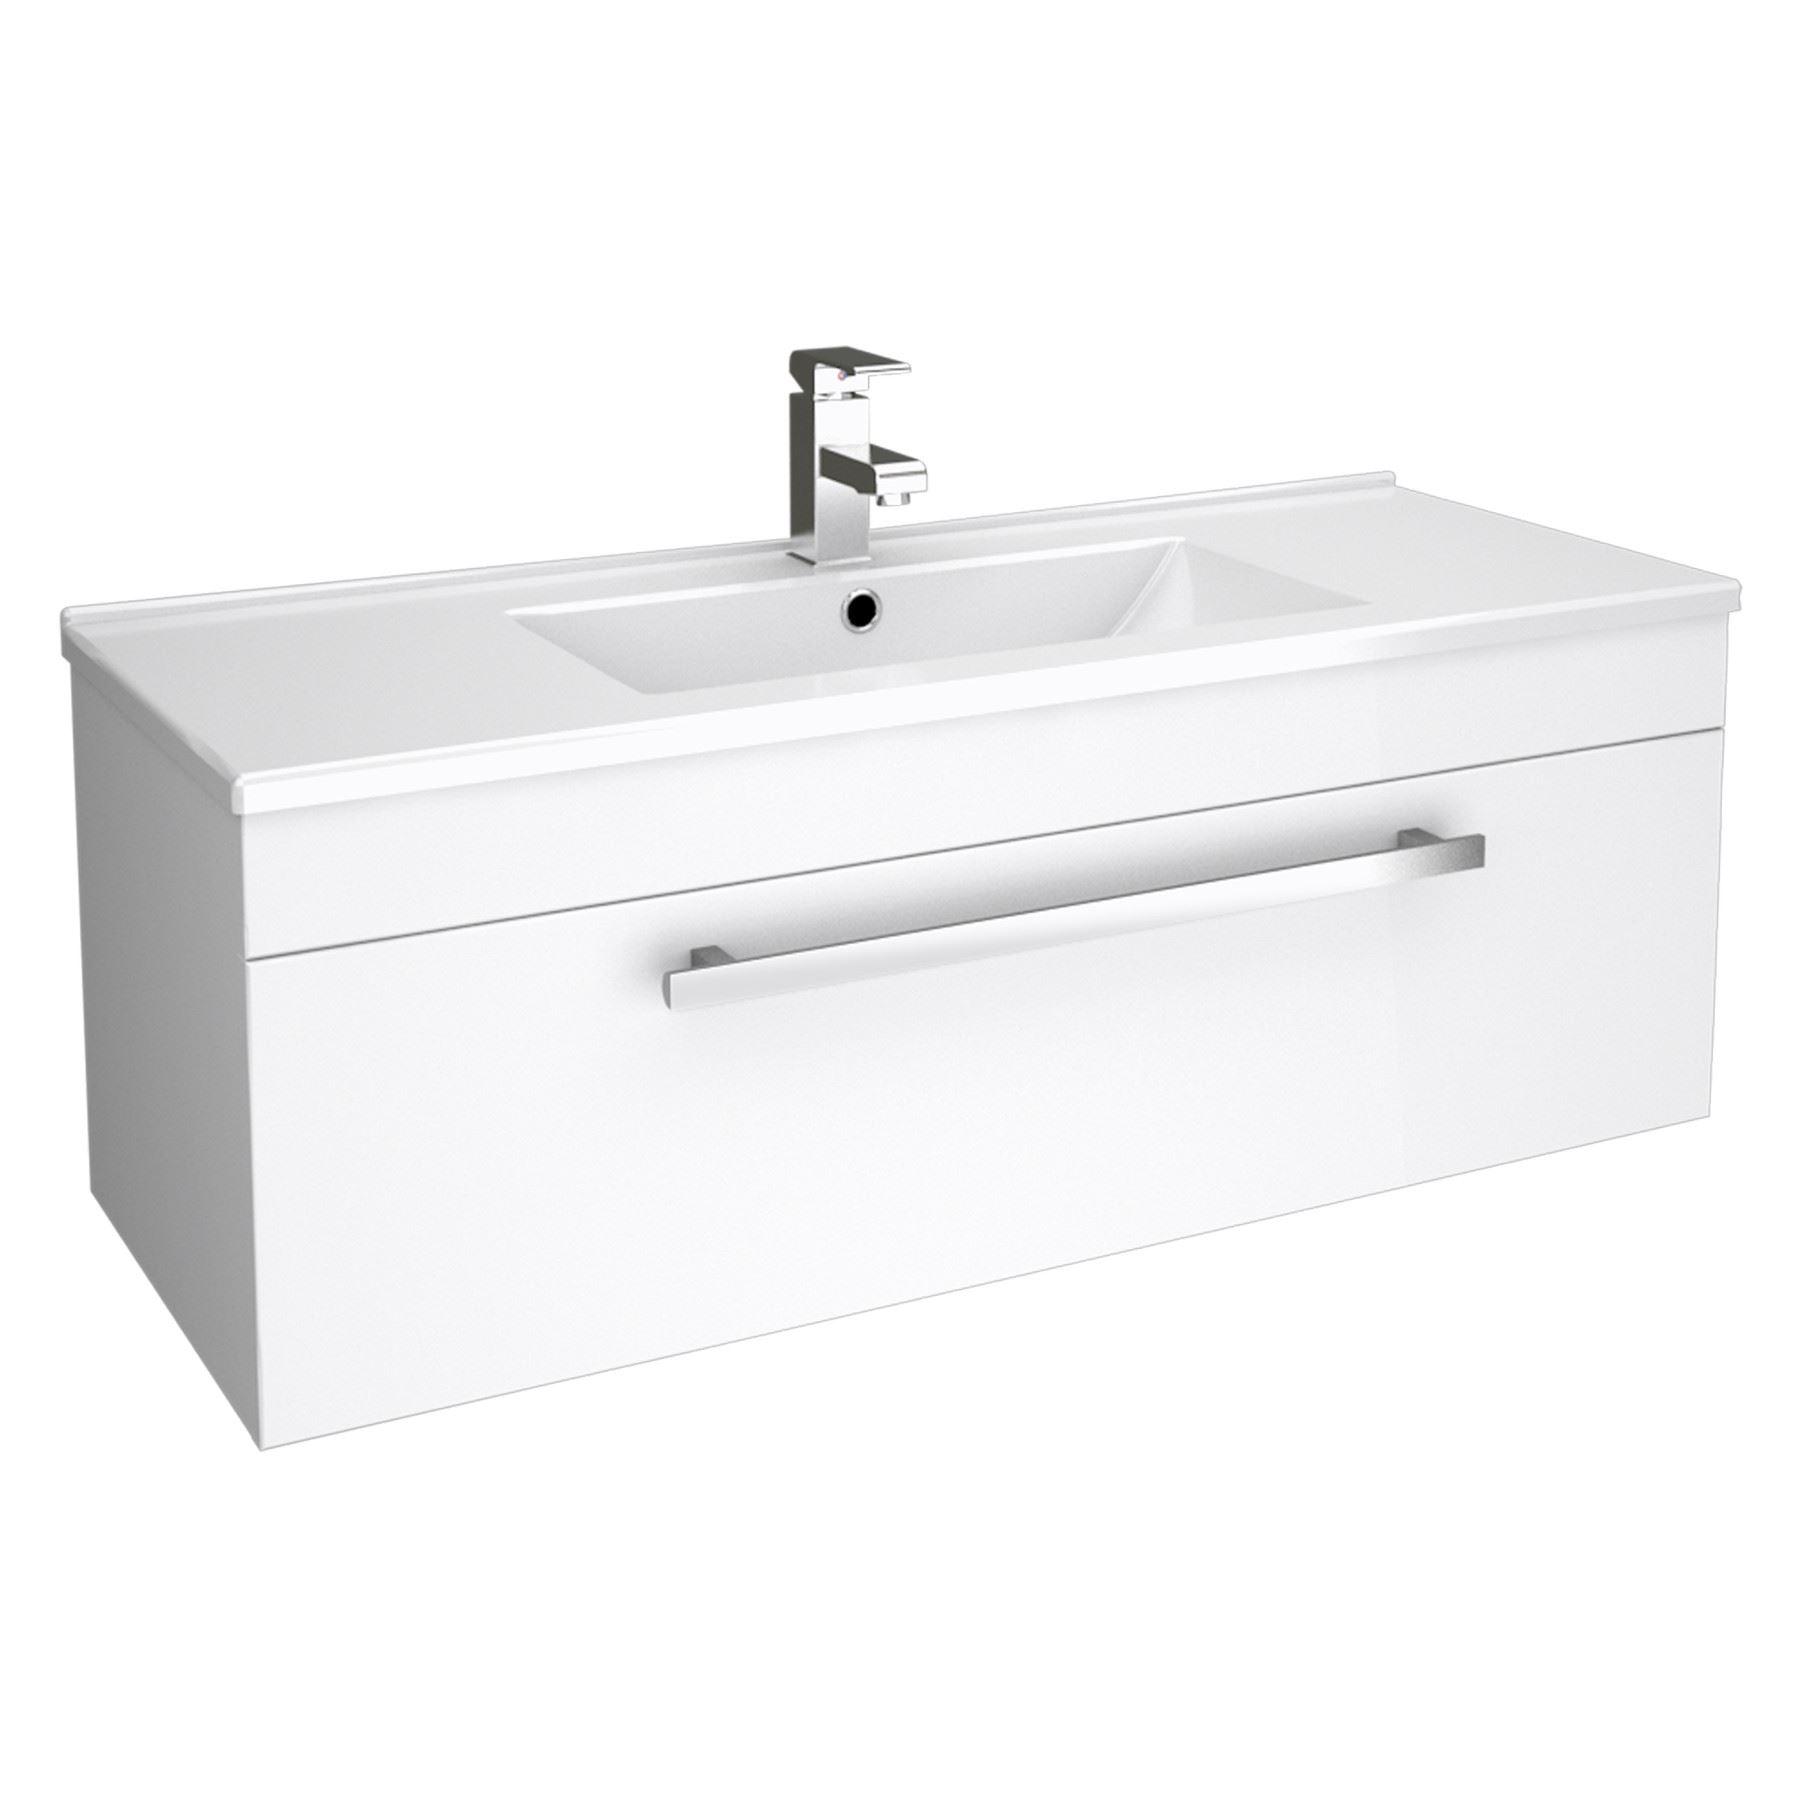 Bathroom Storage Wall Hung Vanity Unit Cloakroom Cabinet Dropdown Sink ...